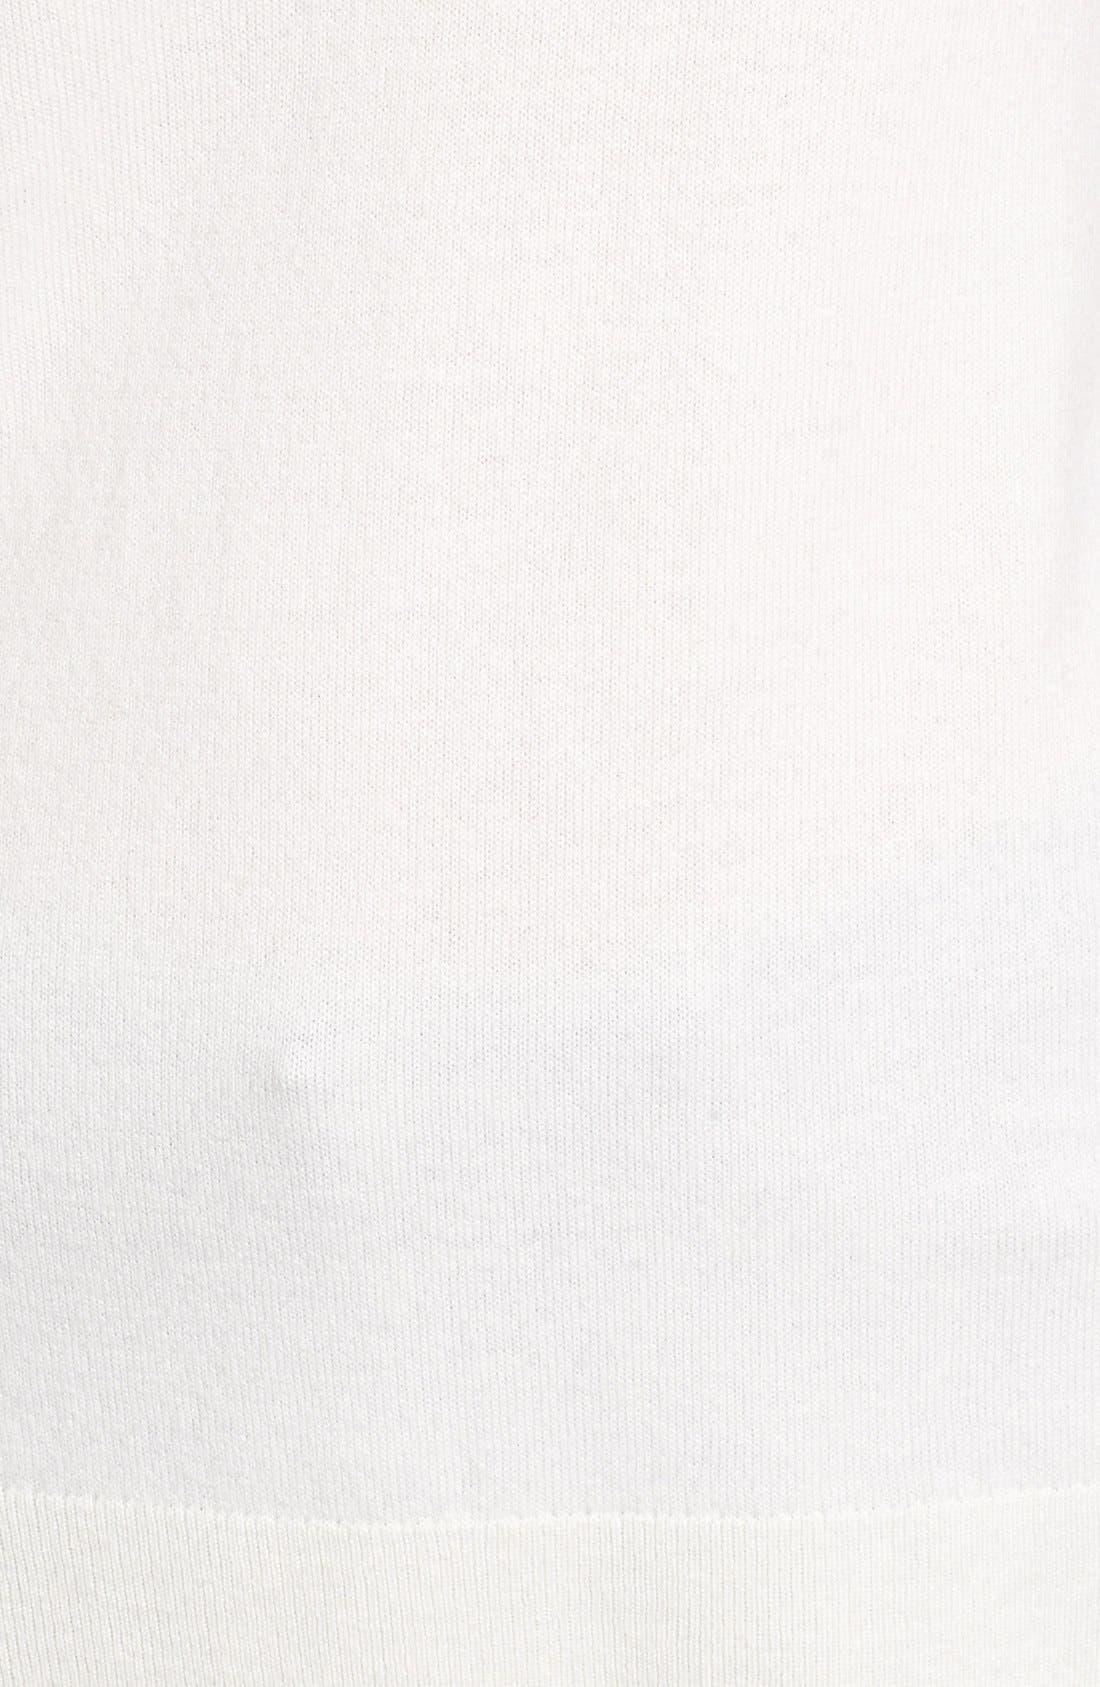 Luna V-Neck Merino & Cashmere Tunic Sweater,                             Alternate thumbnail 5, color,                             Powdered White